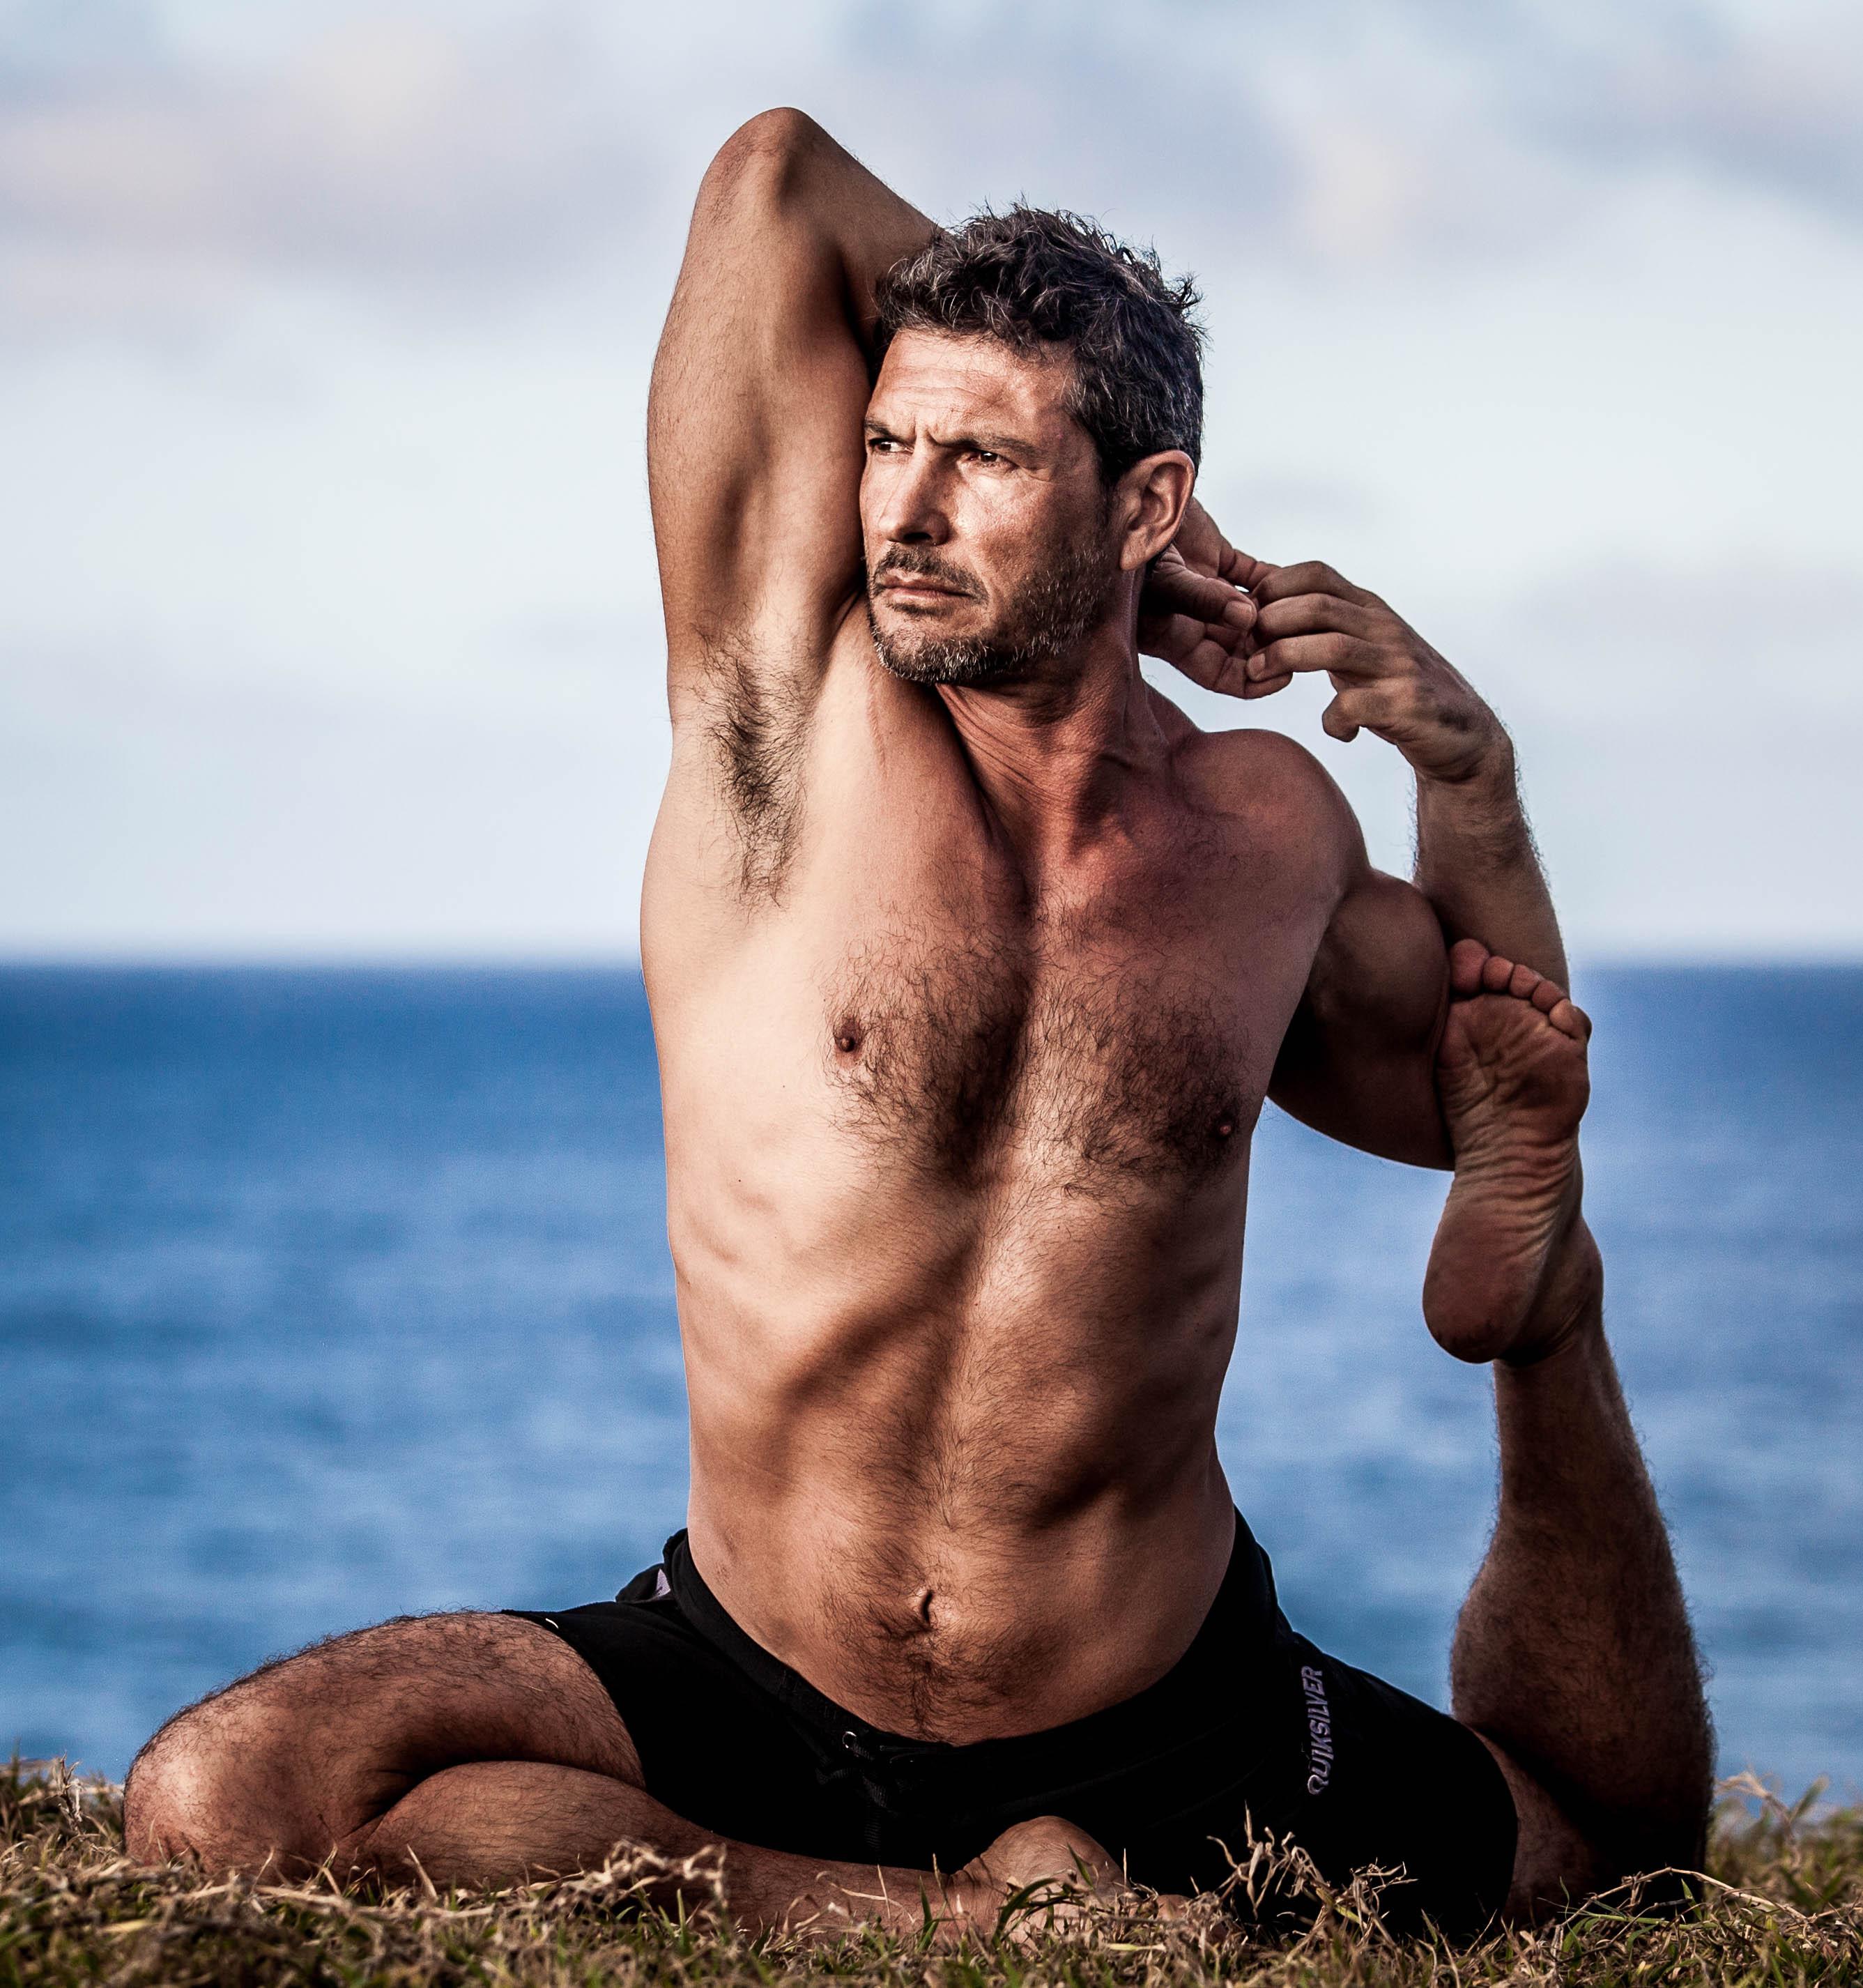 yoga men fitness arik salvador